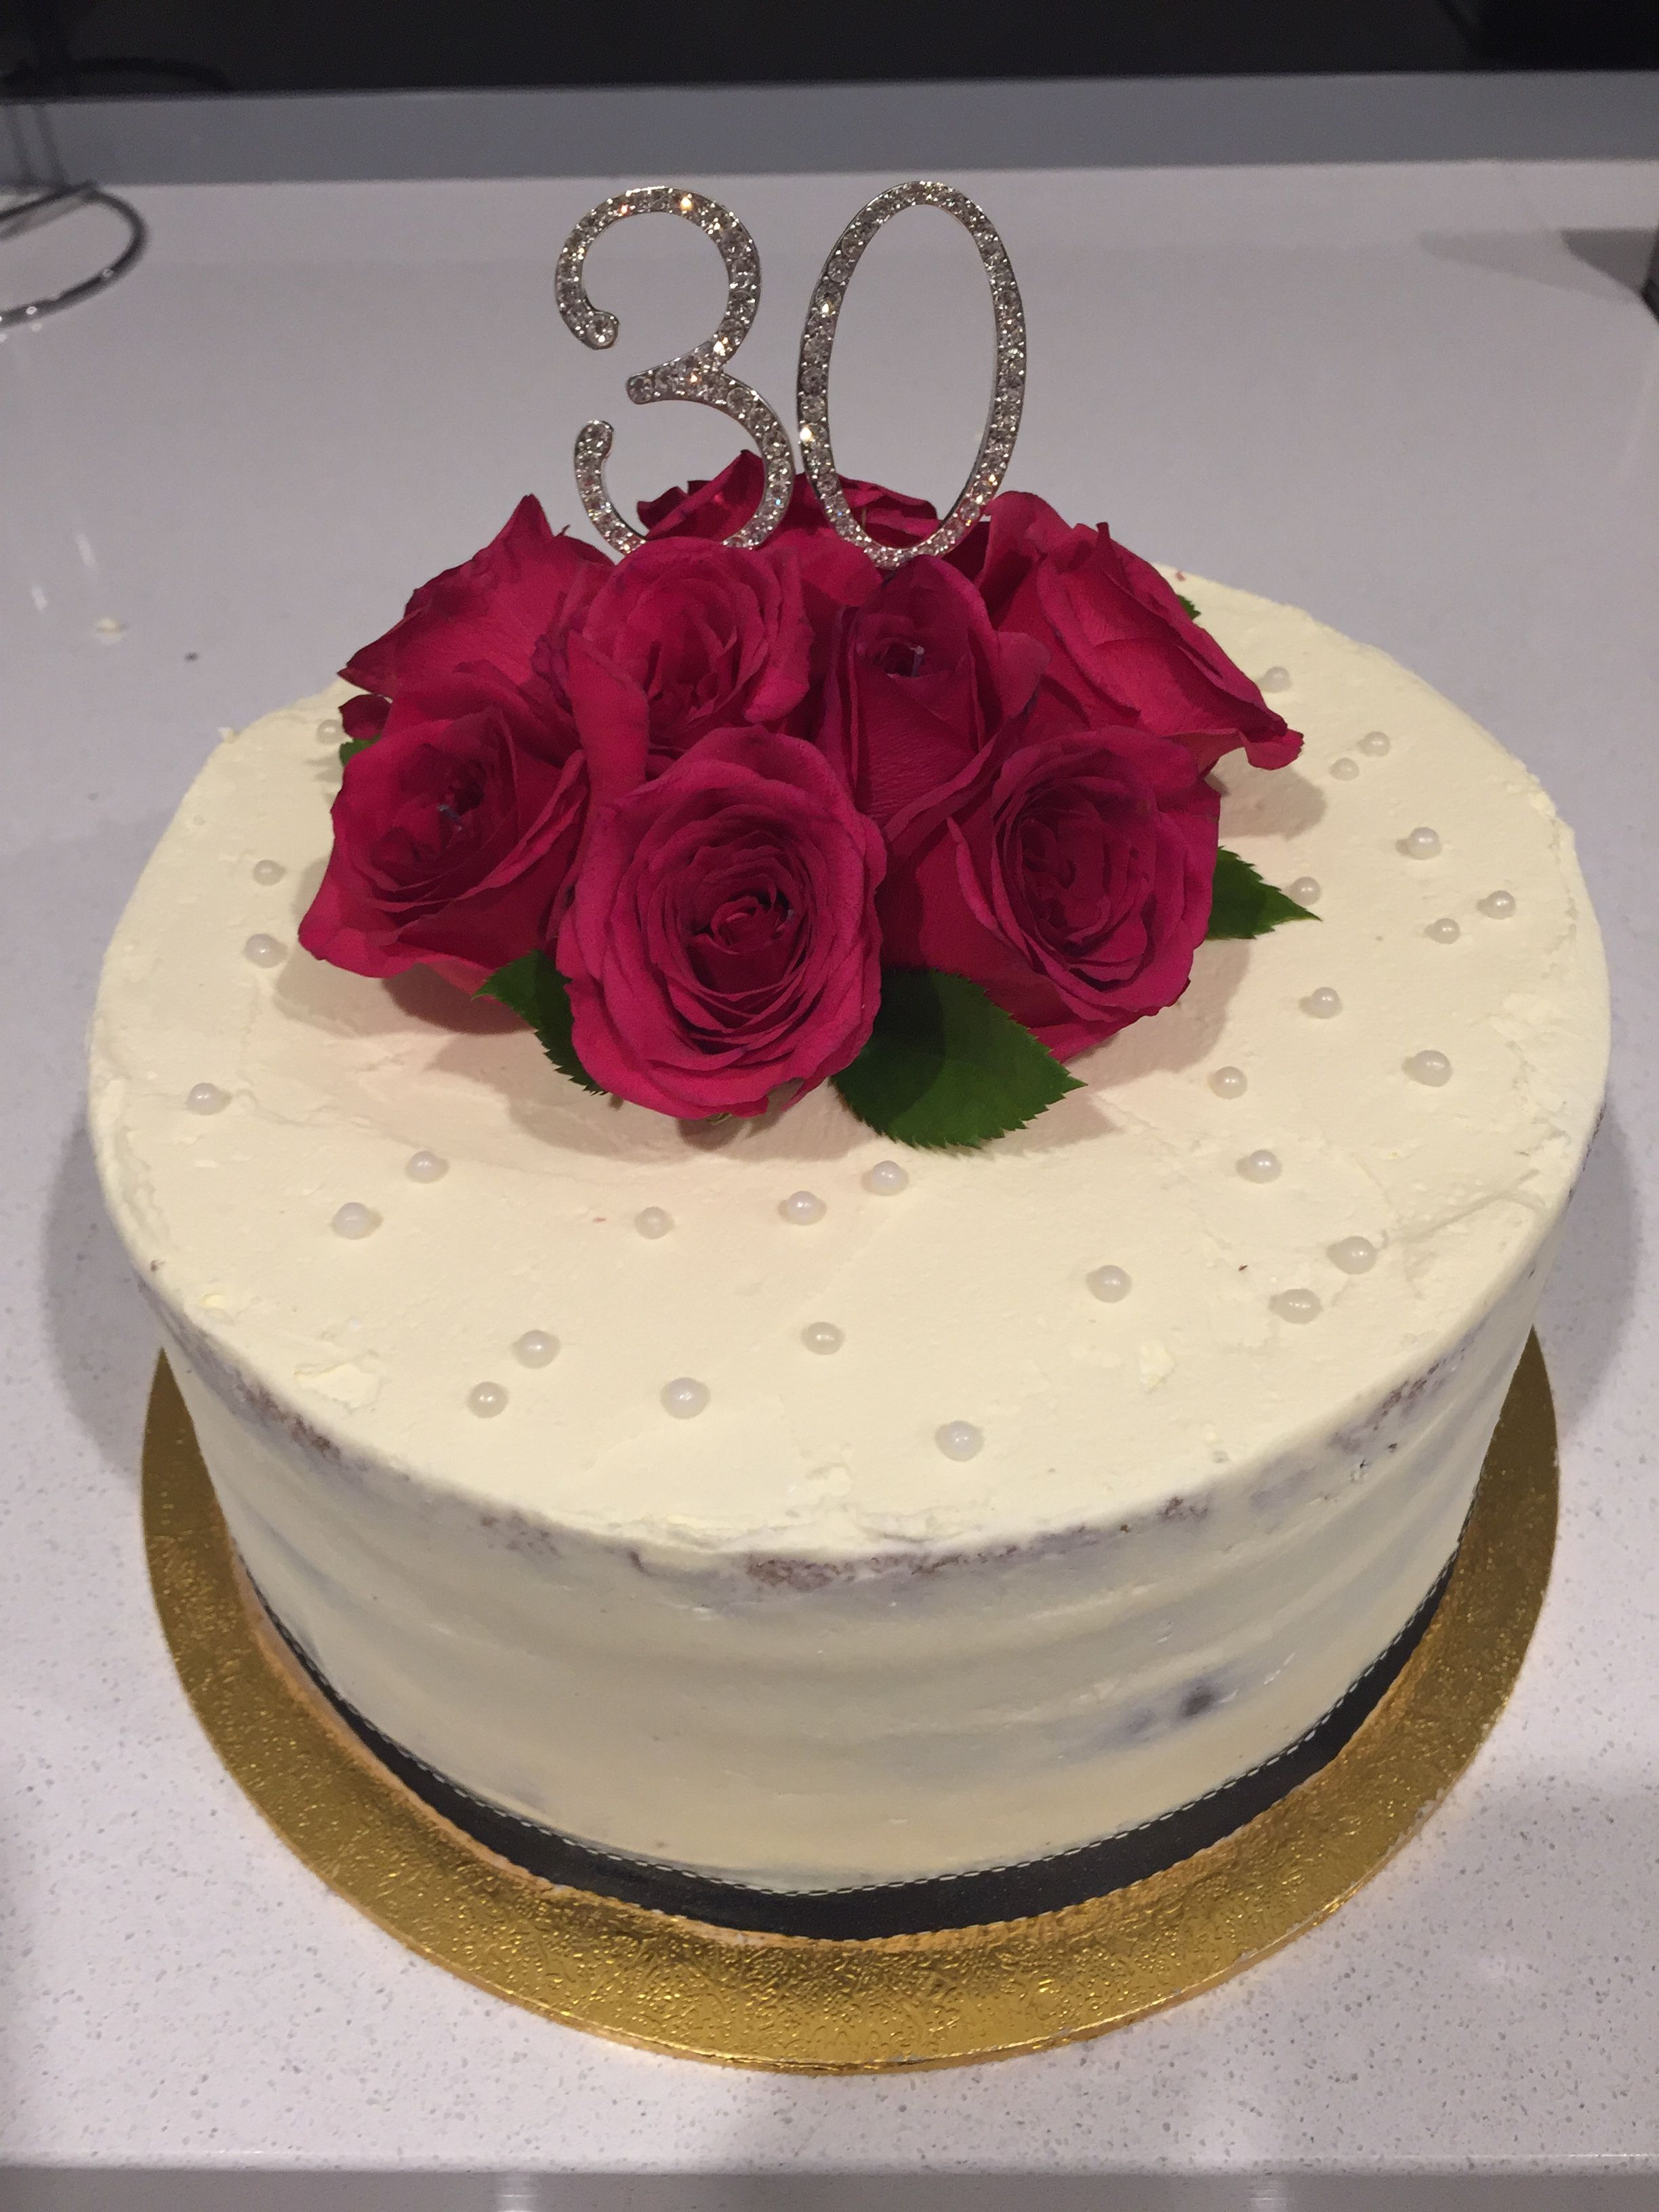 30th birthday semi naked cake with fresh roses cakes pinterest 30th birthday semi naked cake with fresh roses izmirmasajfo